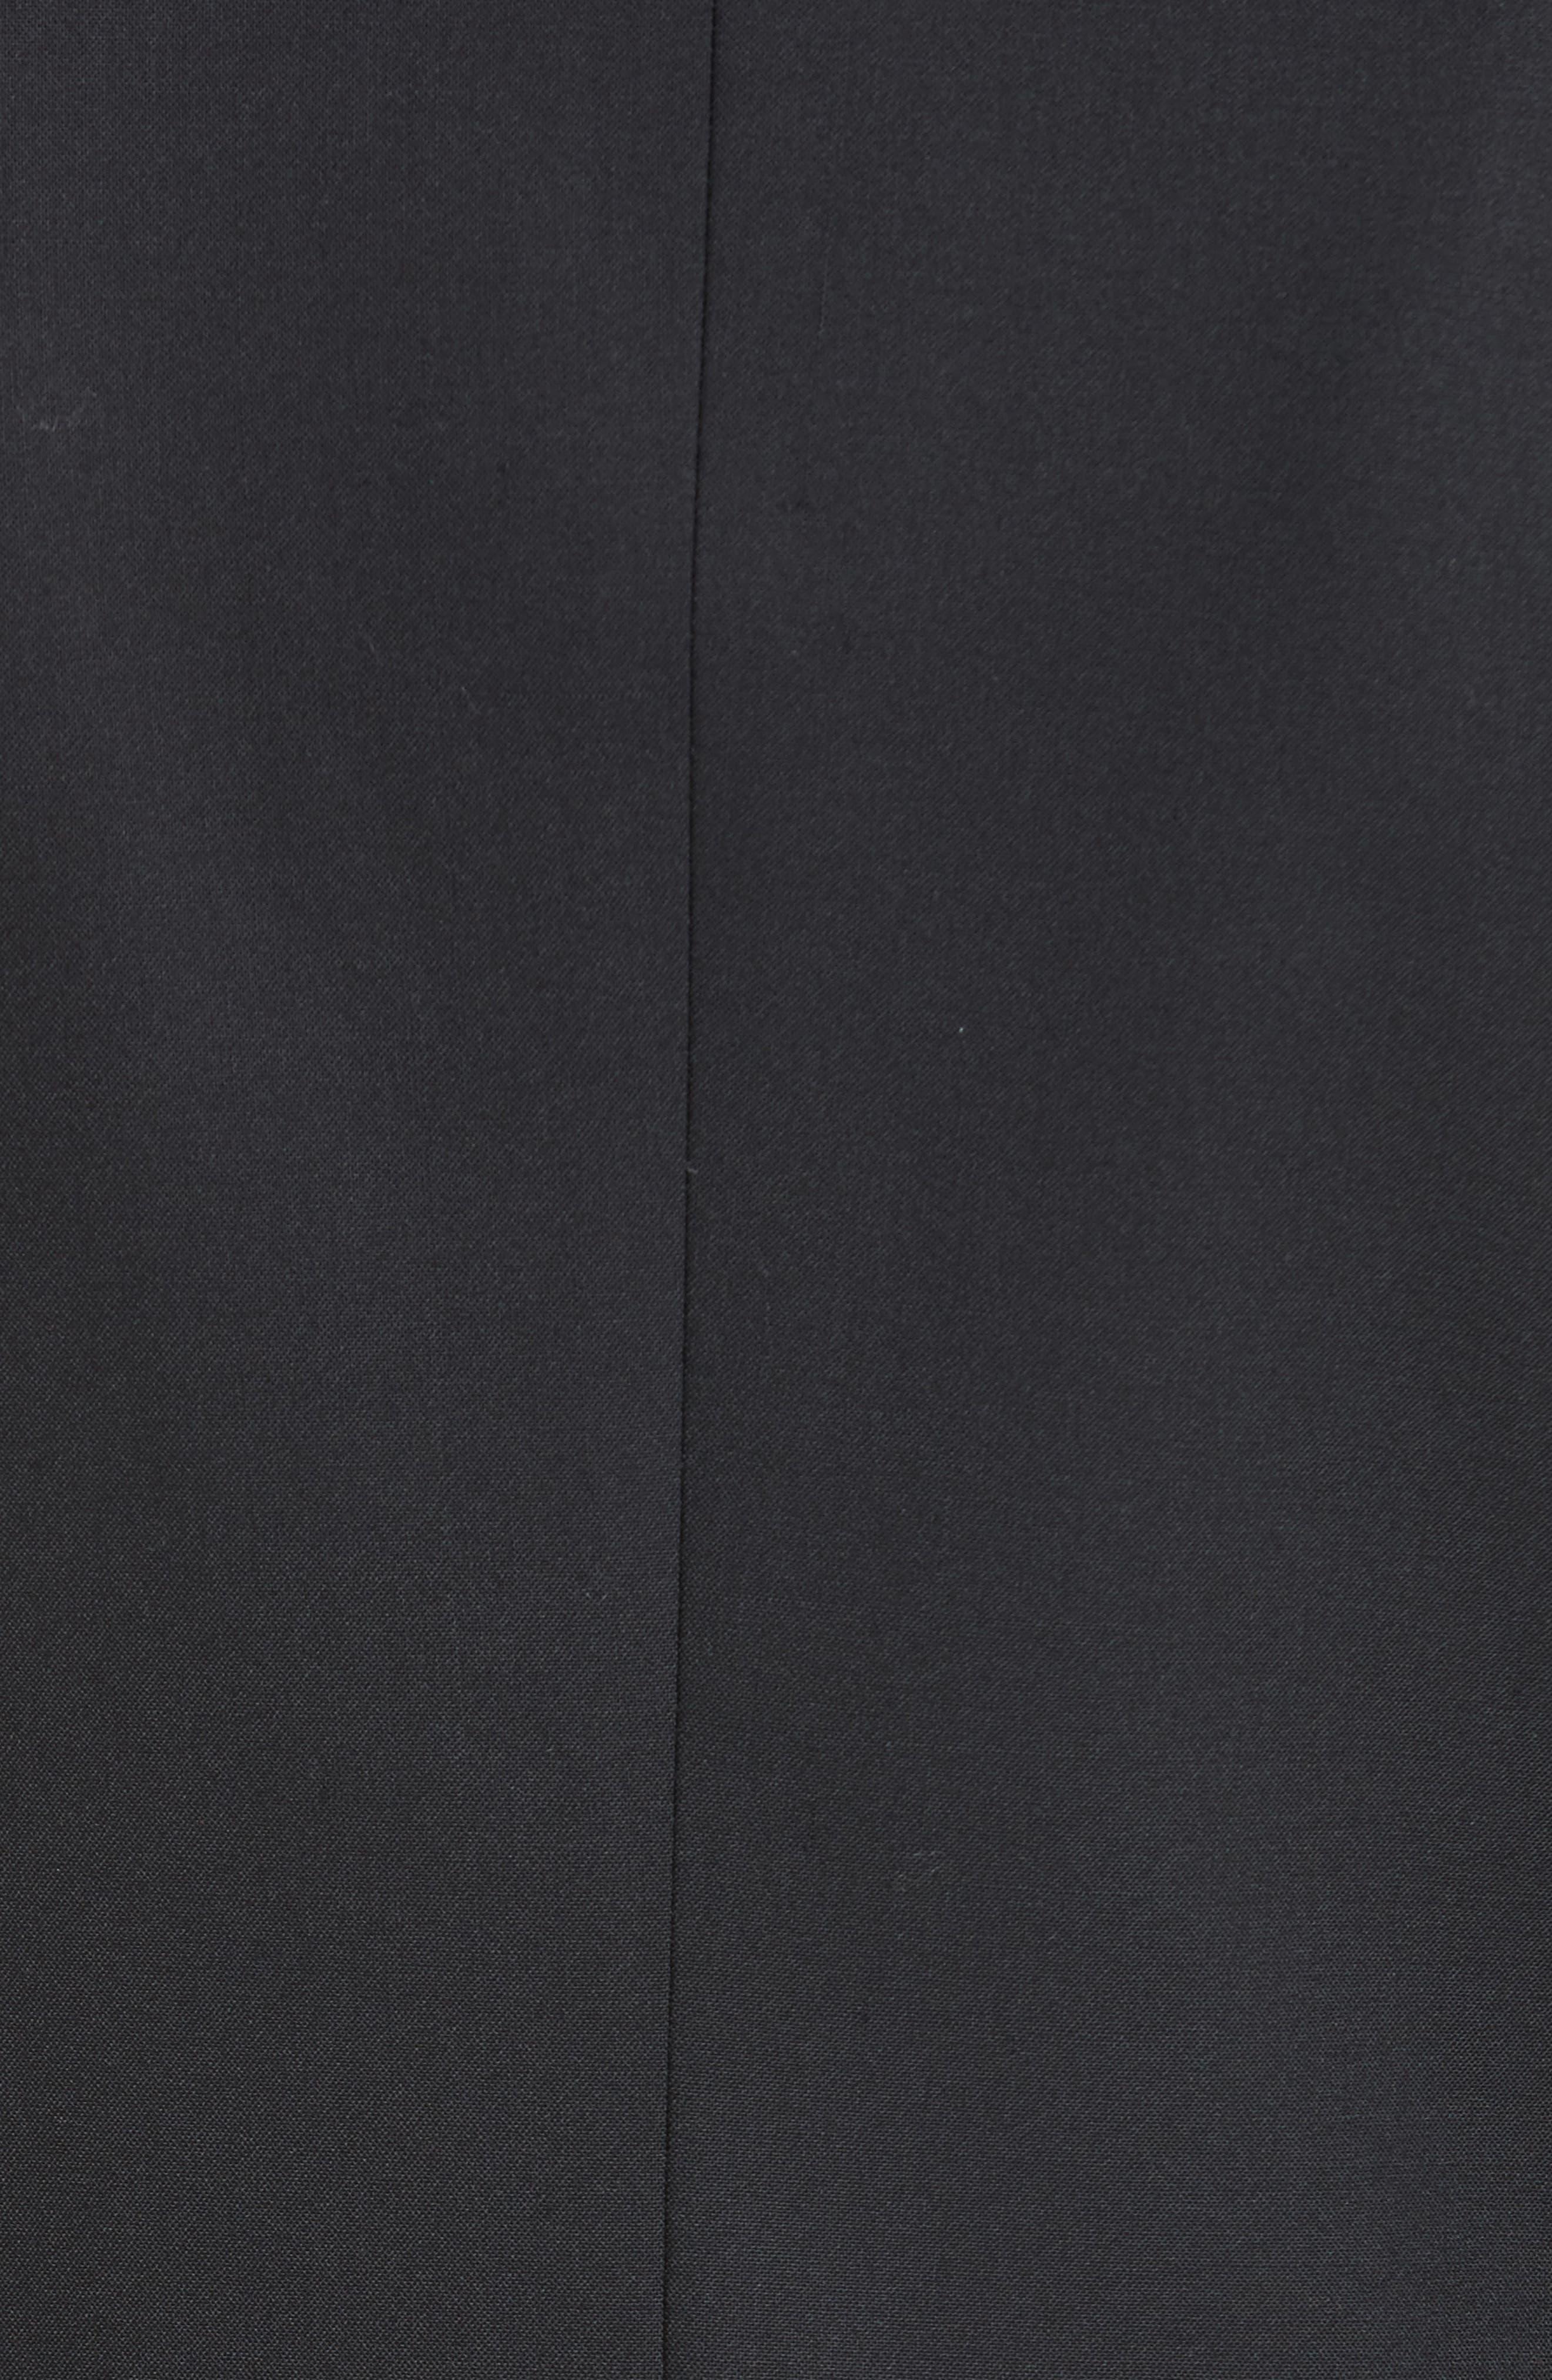 Brince B Good Wool Suit Jacket,                             Alternate thumbnail 6, color,                             BLACK